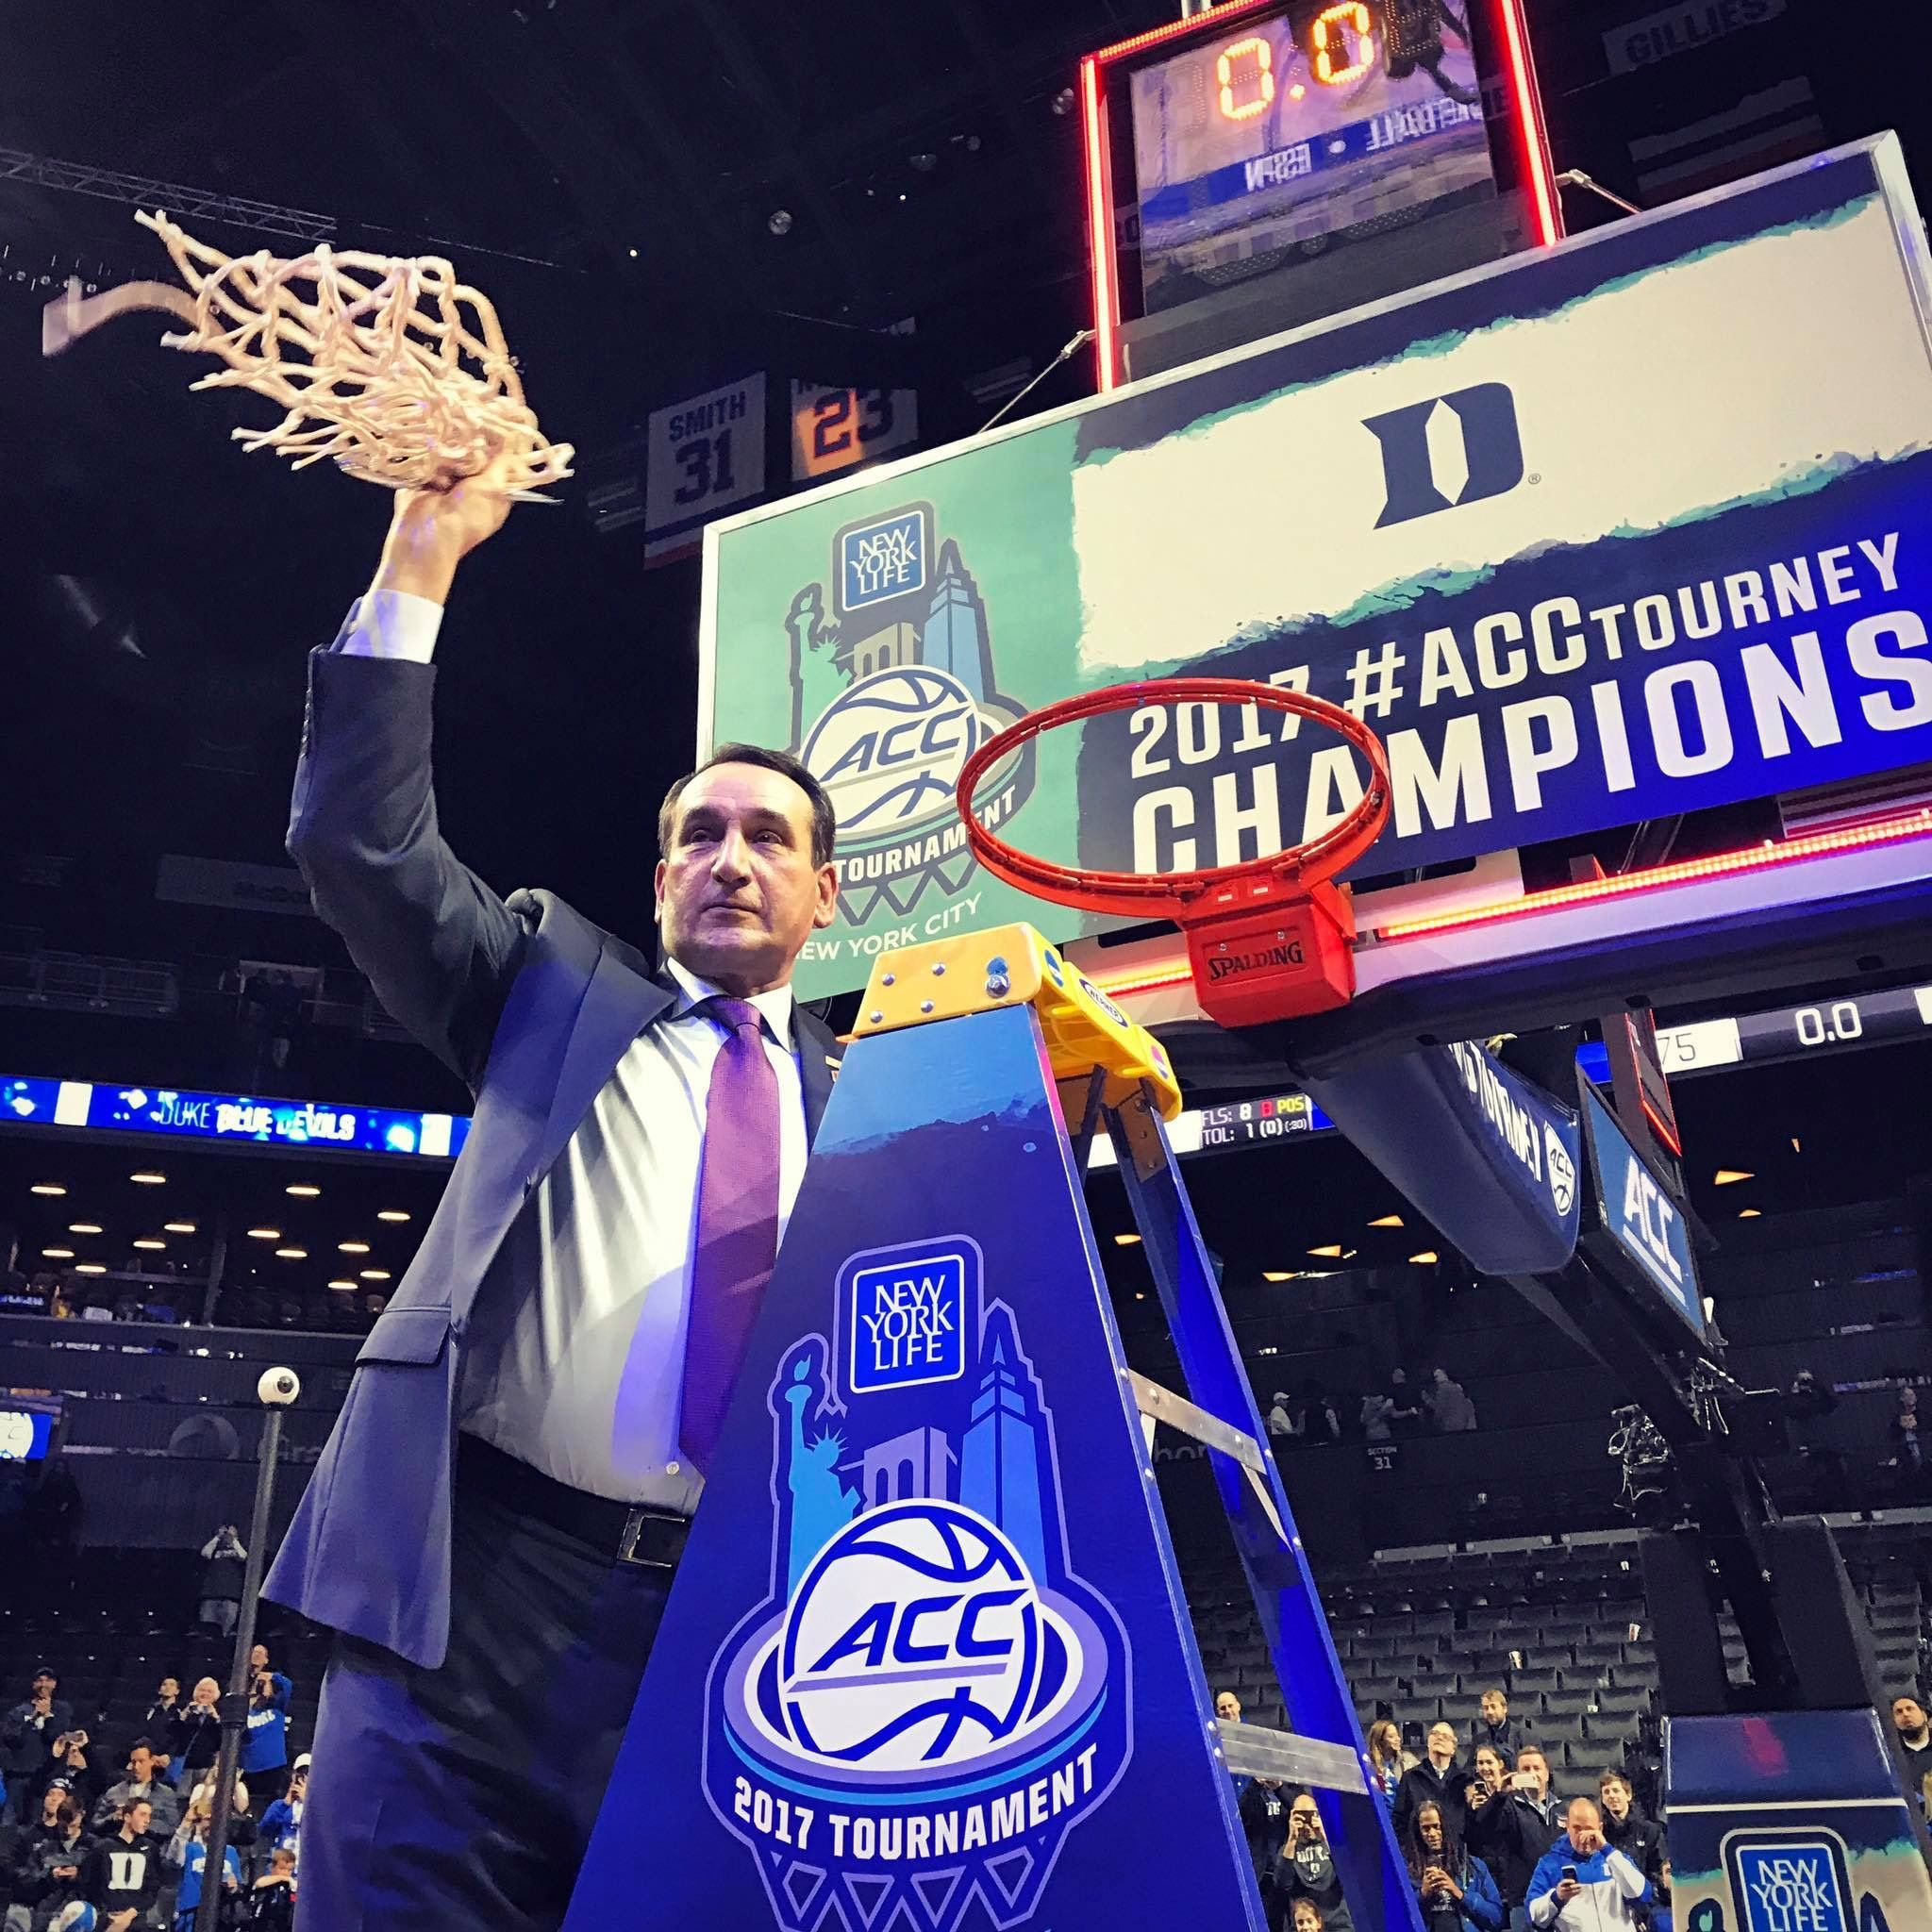 Coach K 2017 ACC Tournament Duke basketball, Duke blue